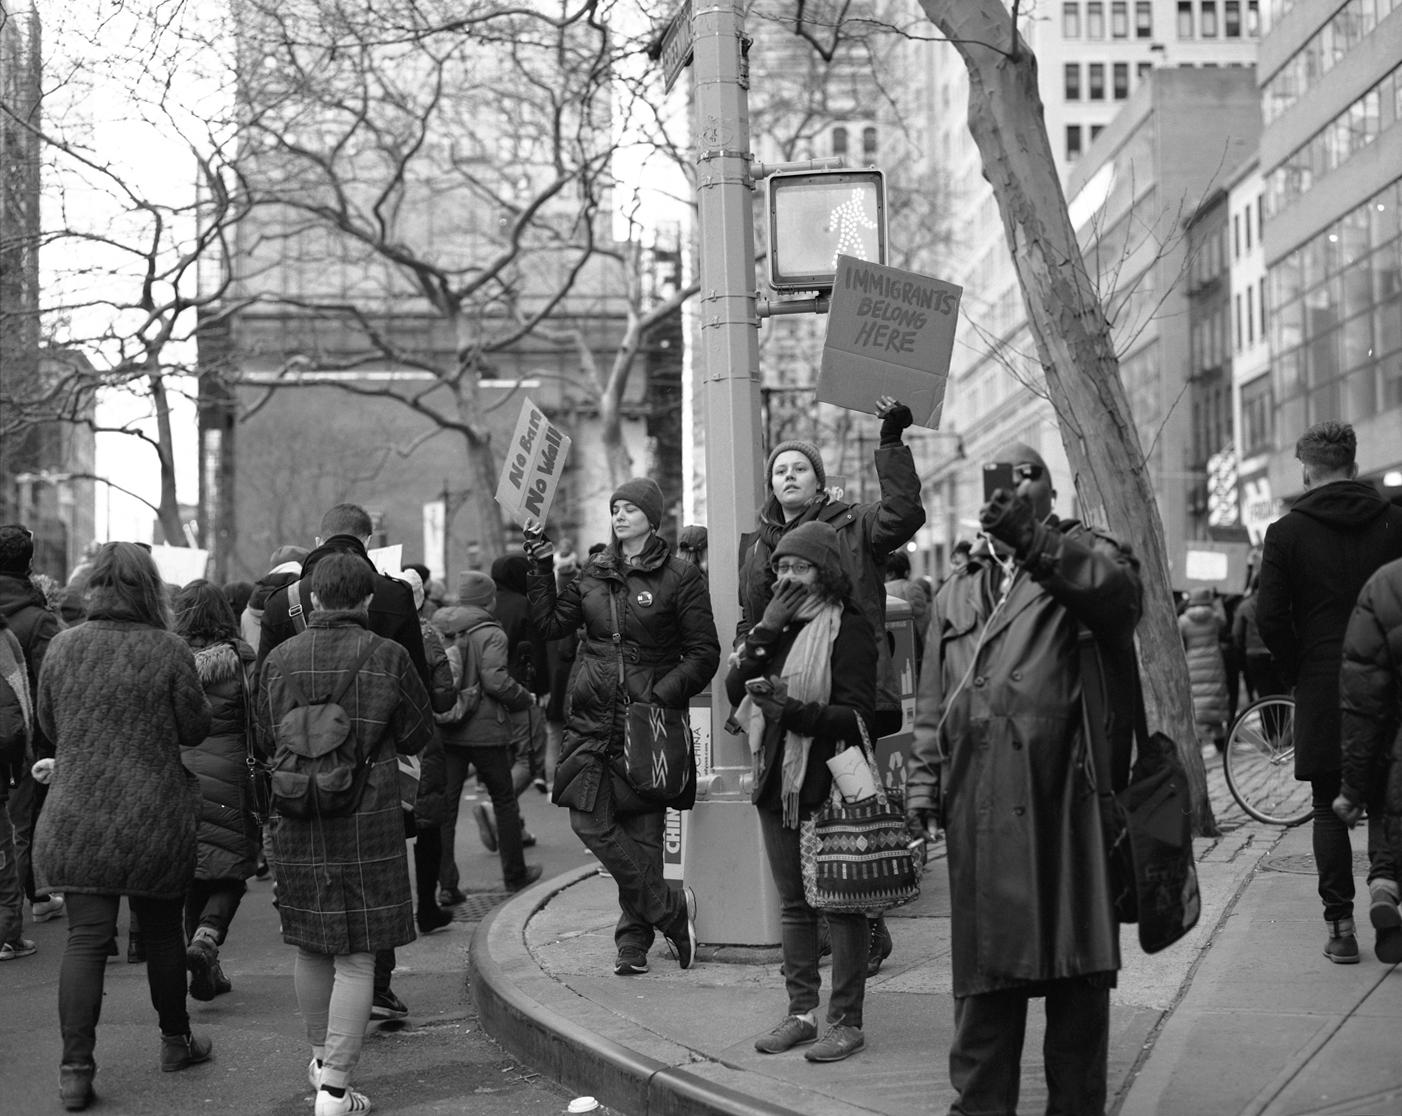 amber_mahoney_the_resistance_film_011.jpg